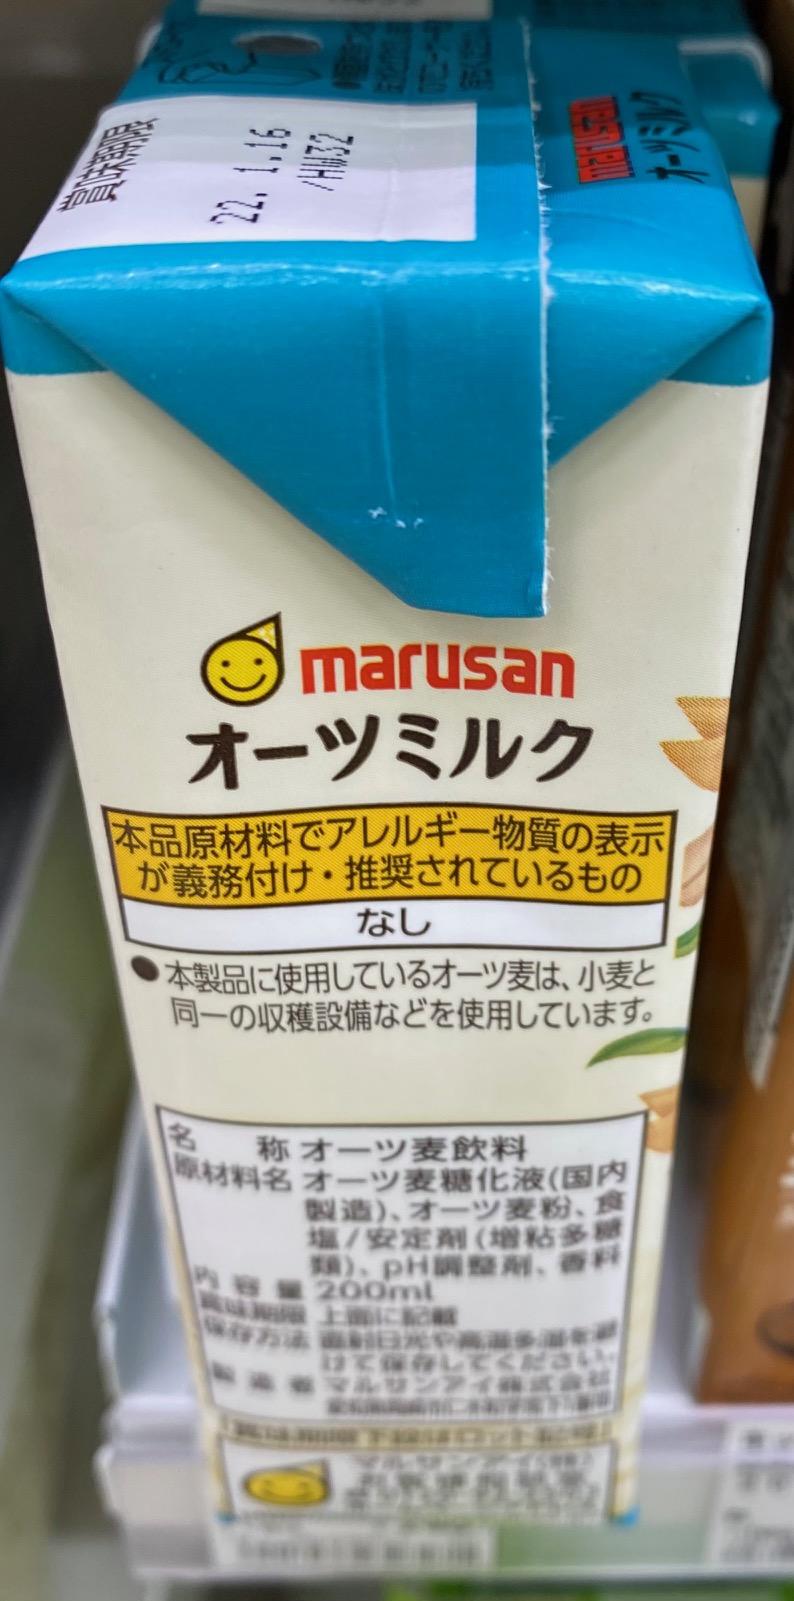 Marusan Oat Milk ingredient panel, Lawson